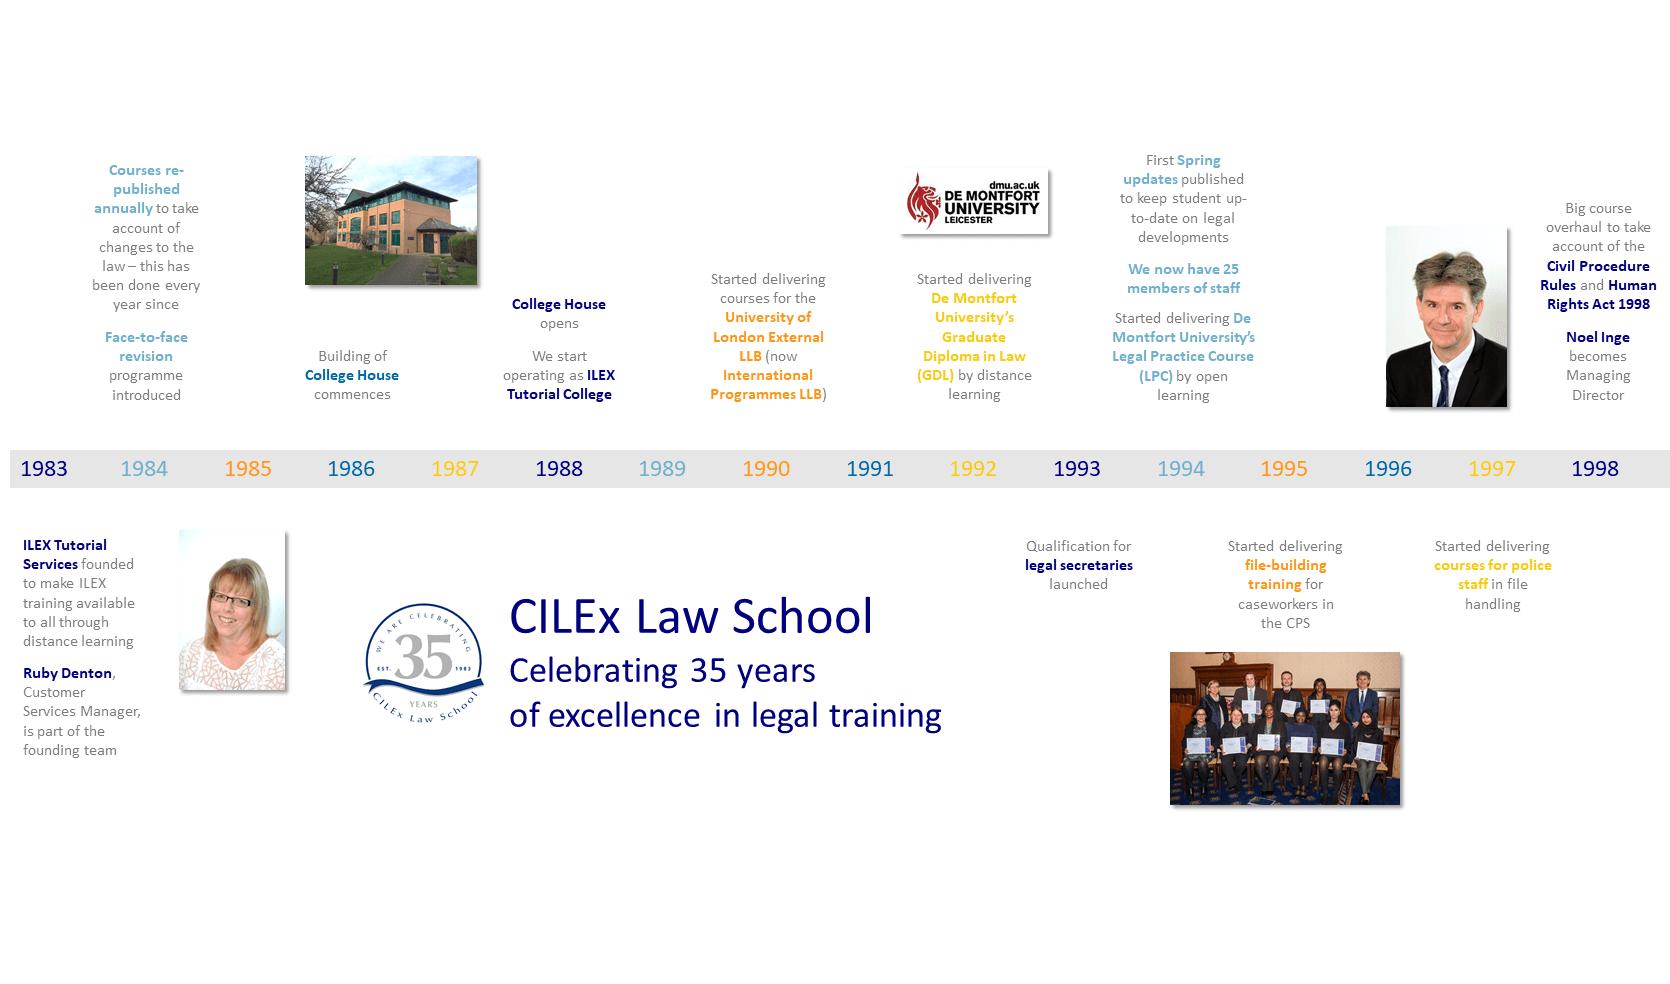 Summary of CILEx Law Schools 35 year history